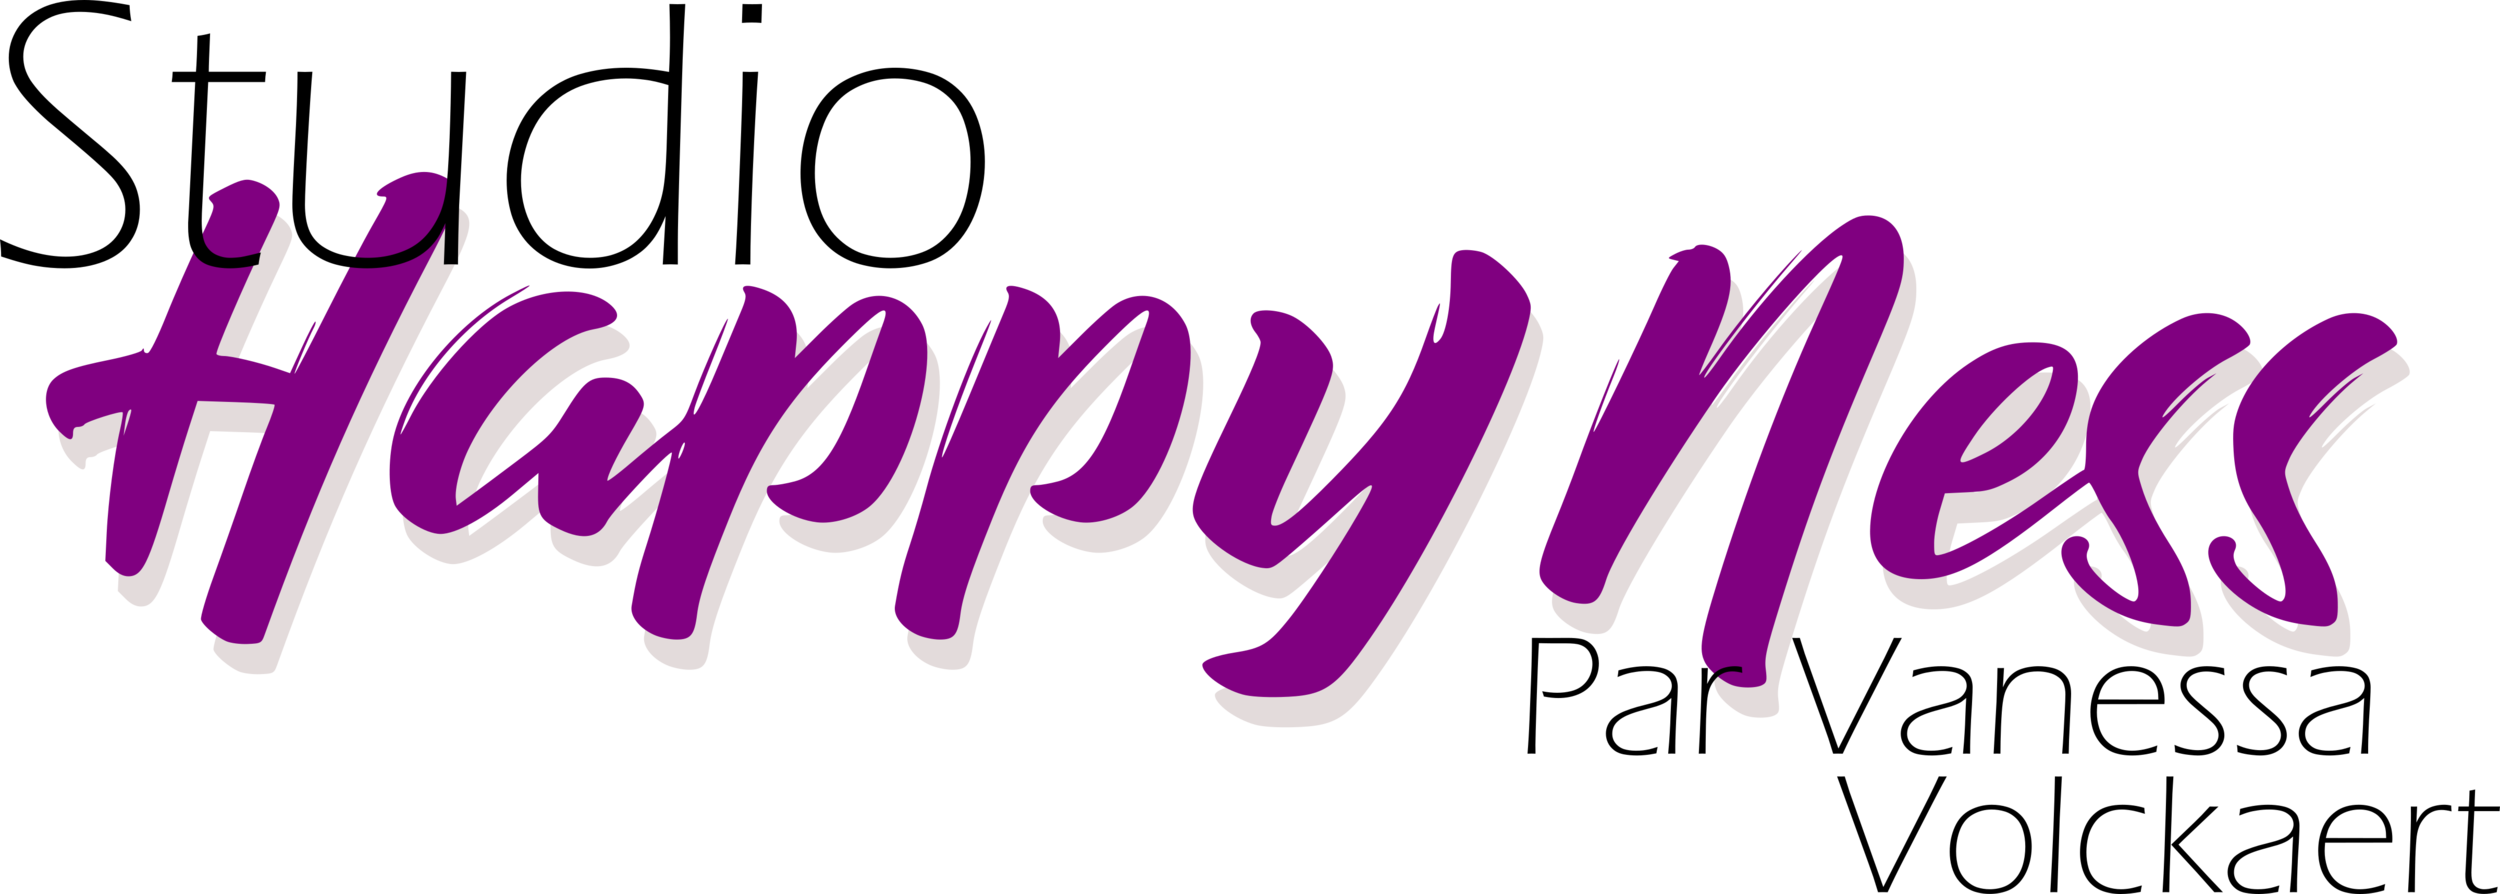 Studio HappyNess Sticker.png